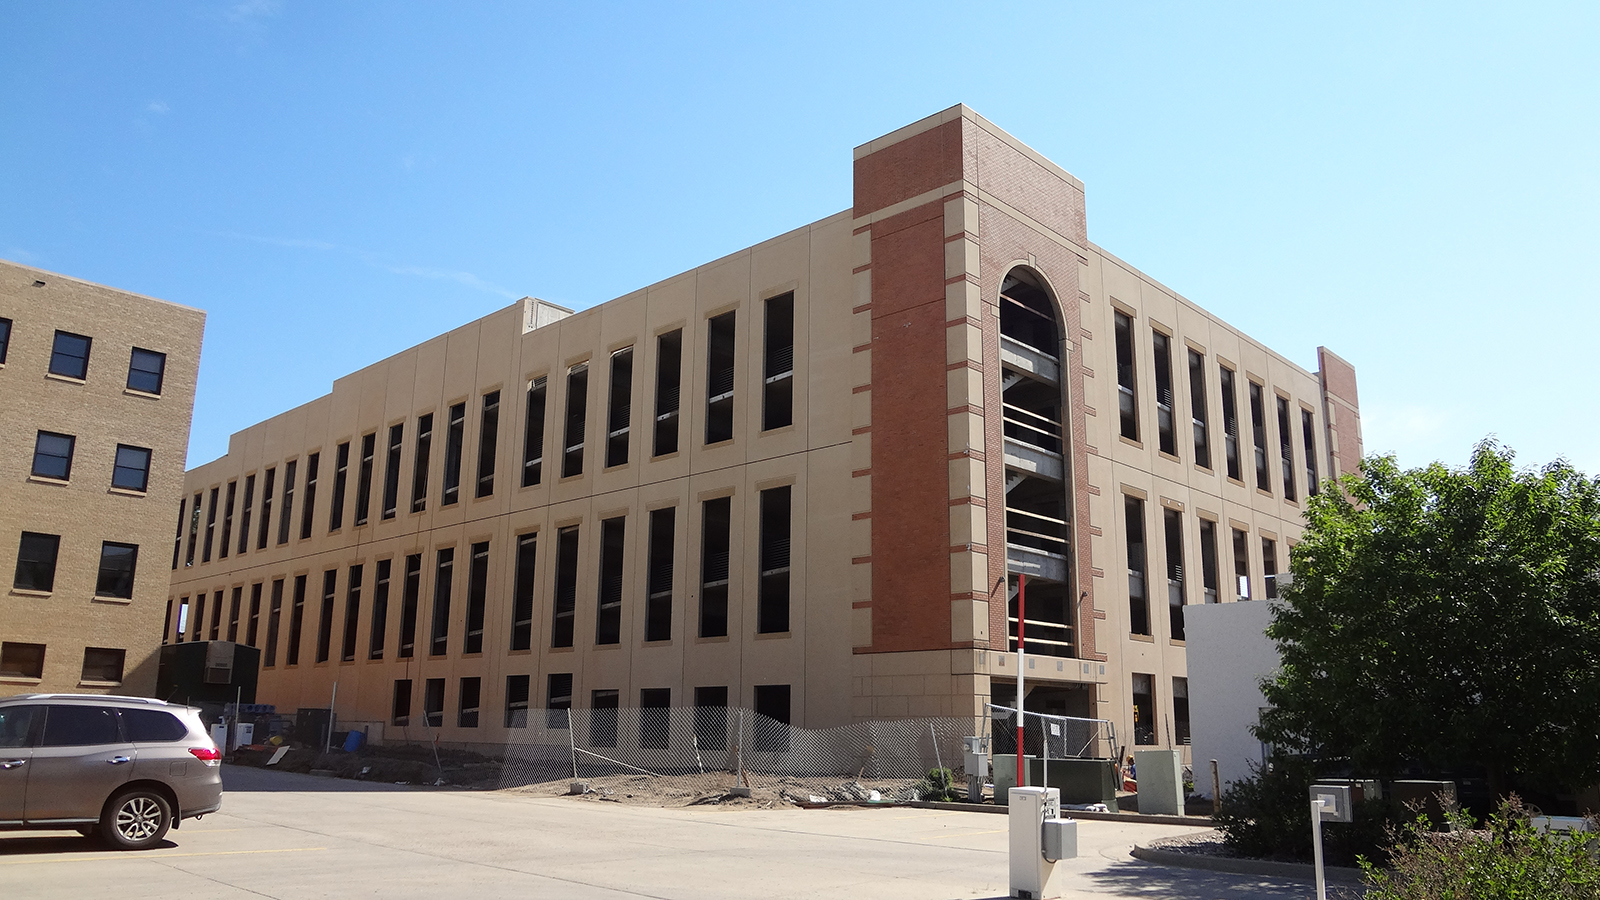 Downtown Bismarck July 2014 - New Parking Ramp (2)